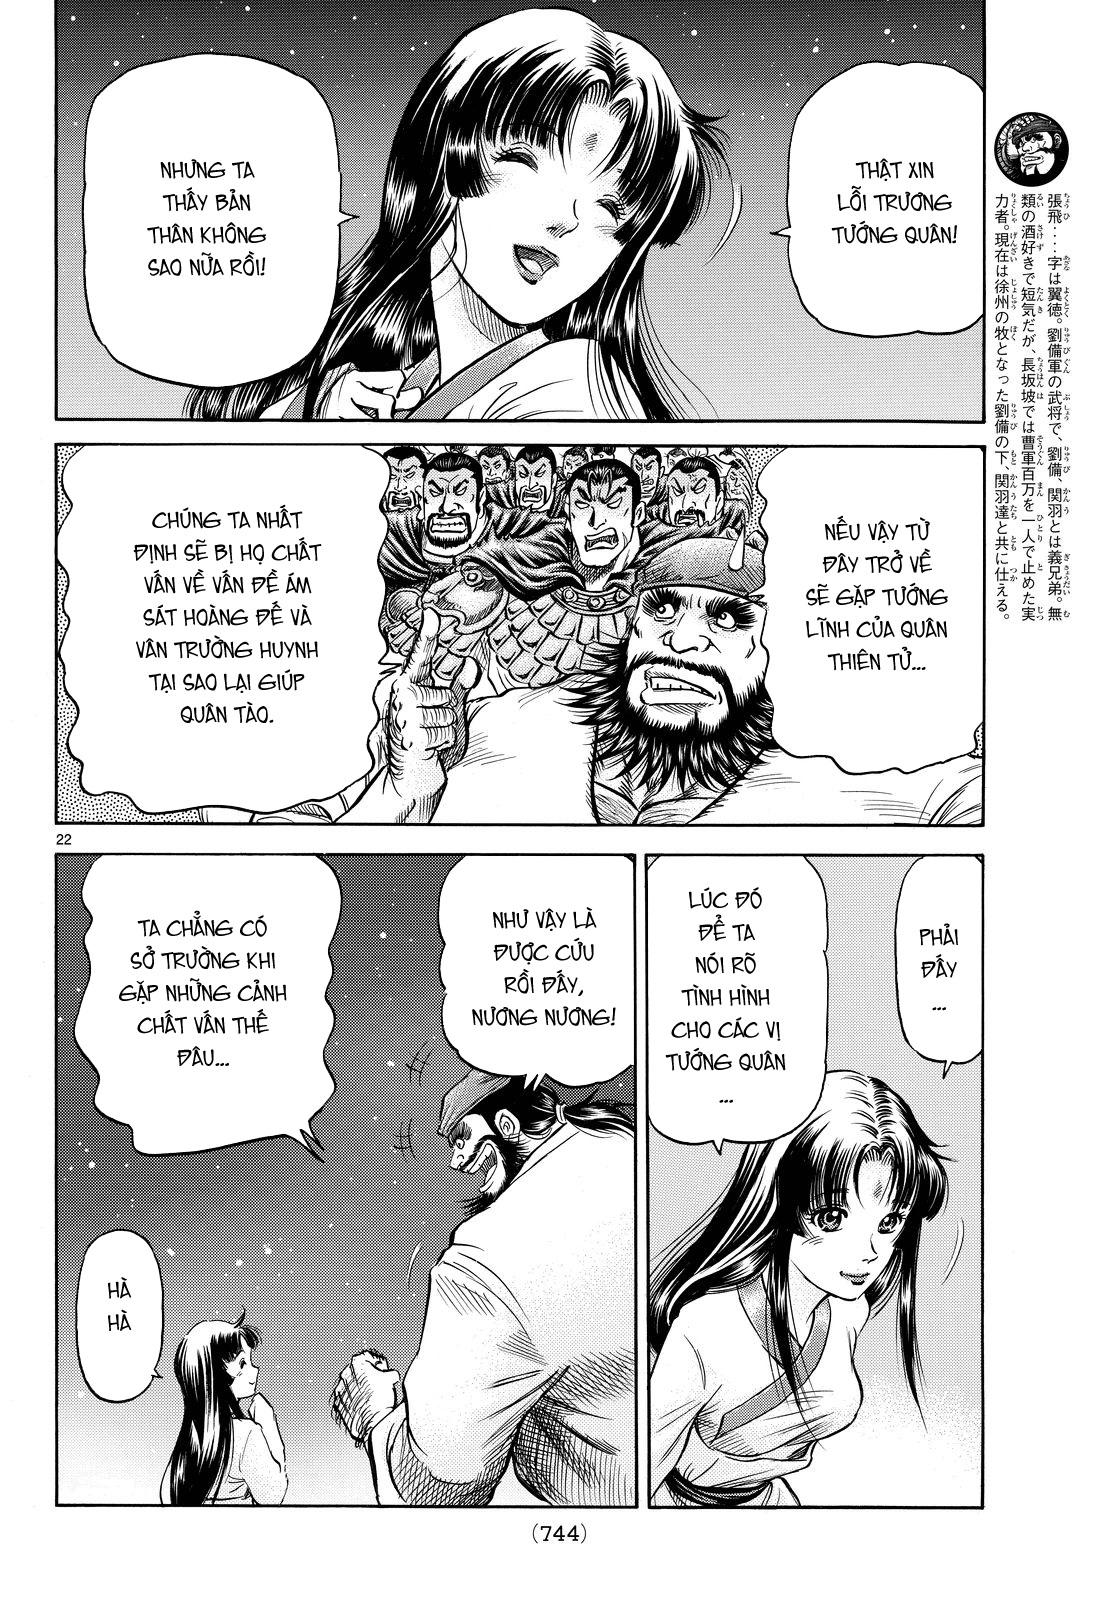 Ryuuroden chu be rong chap 265 trang 21 manga24h